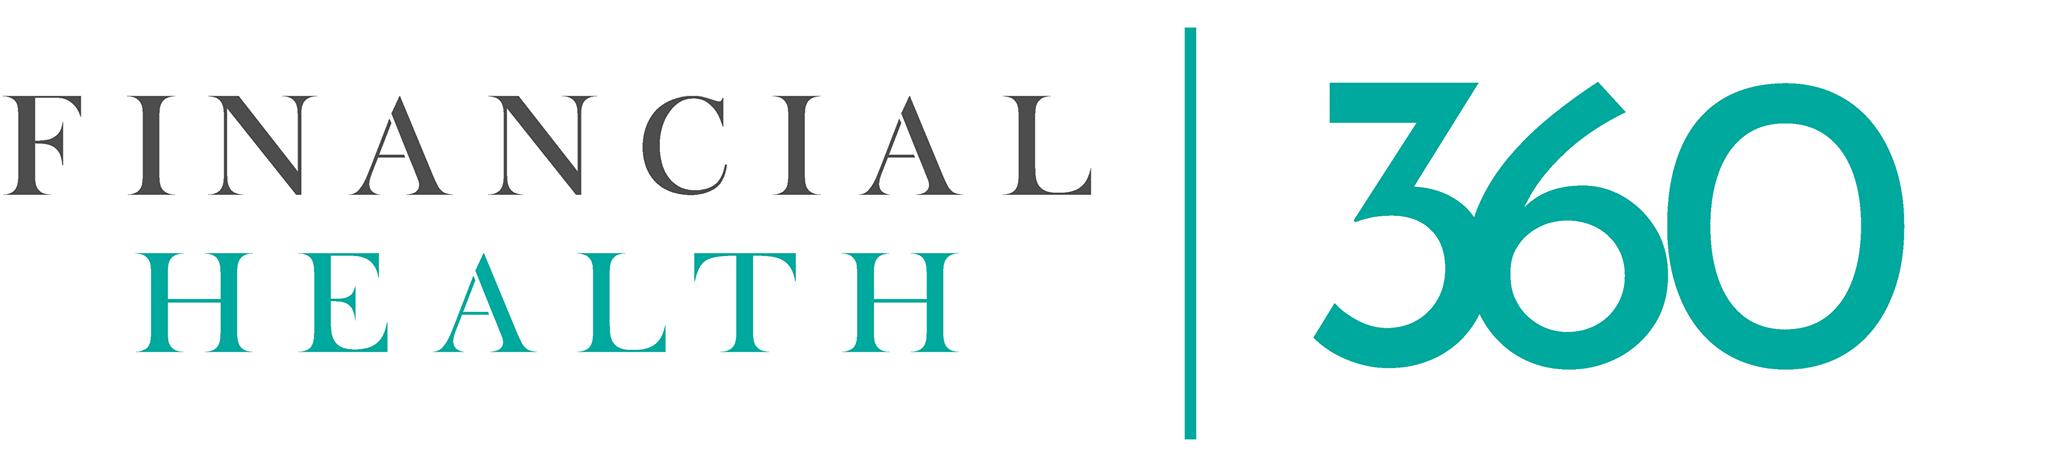 Financial Health 360